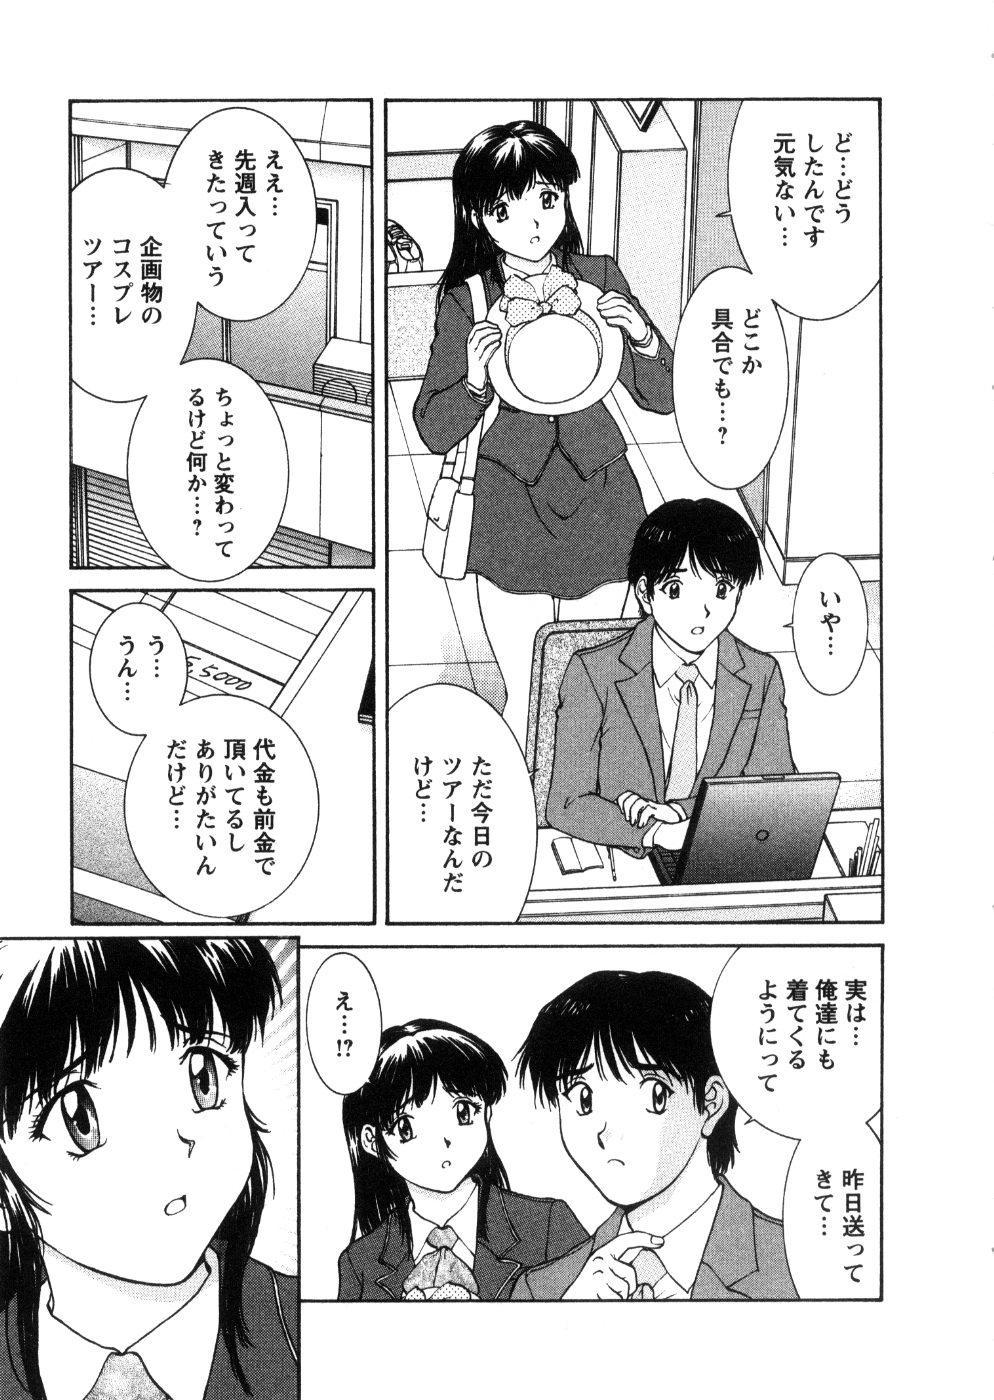 Oneechan-tachi ga Yatte Kuru 03 174